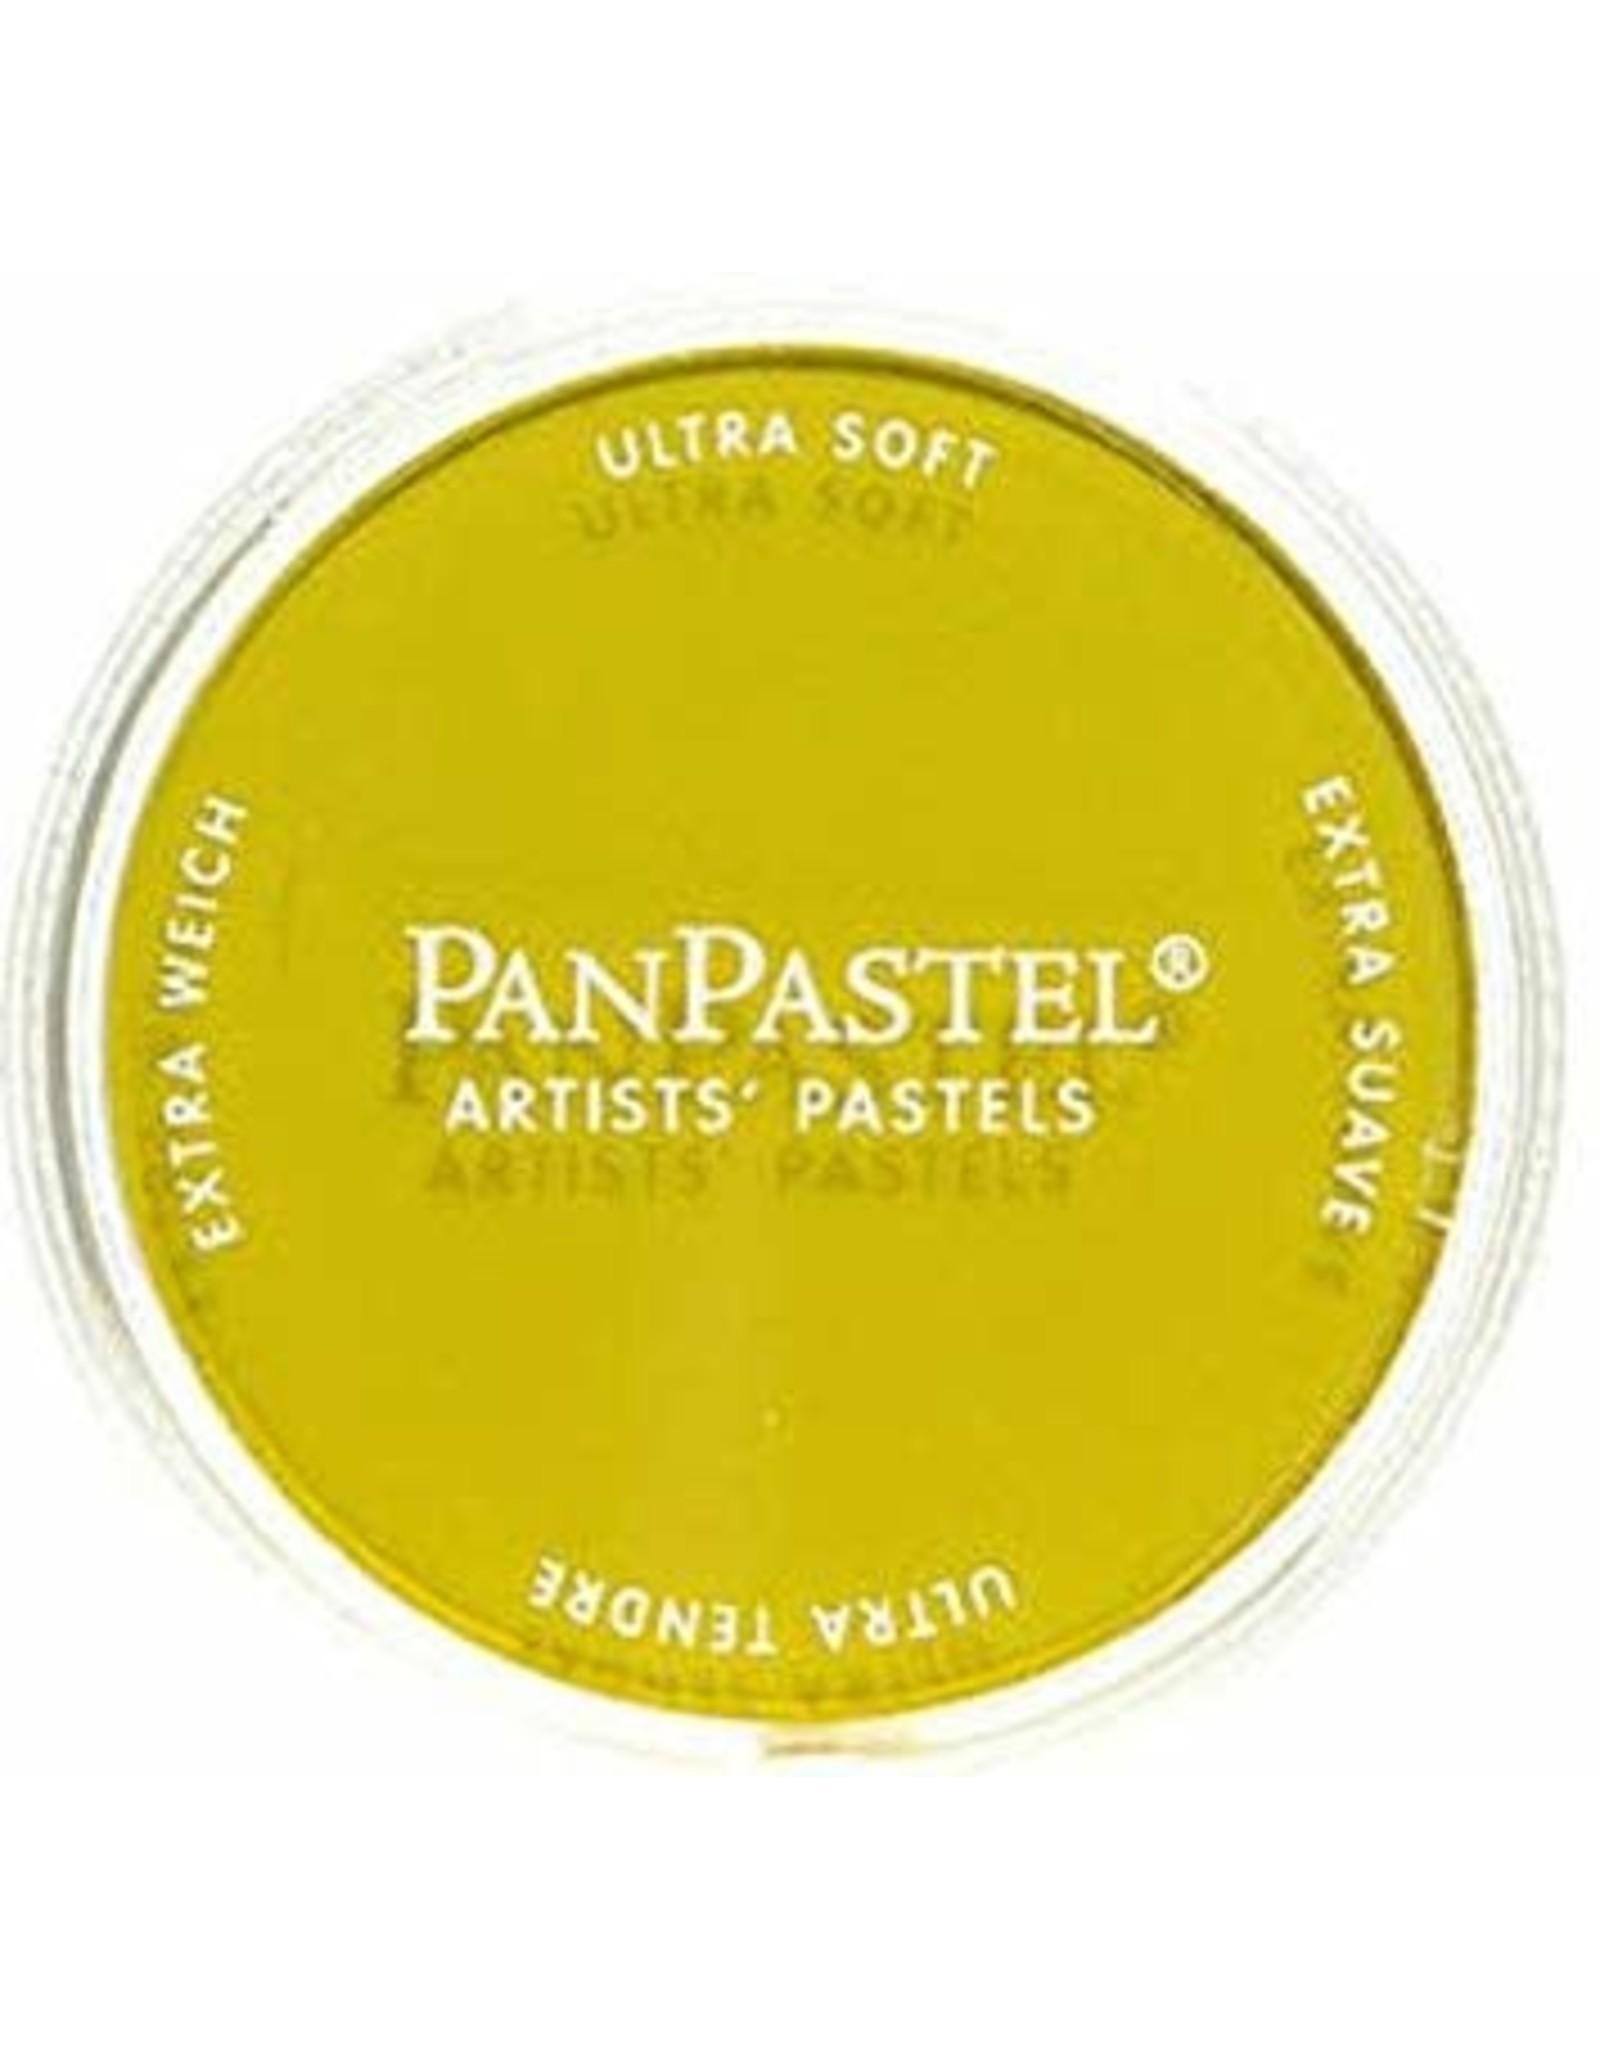 Colorfin LLC Diarylide Yellow - PanPastel